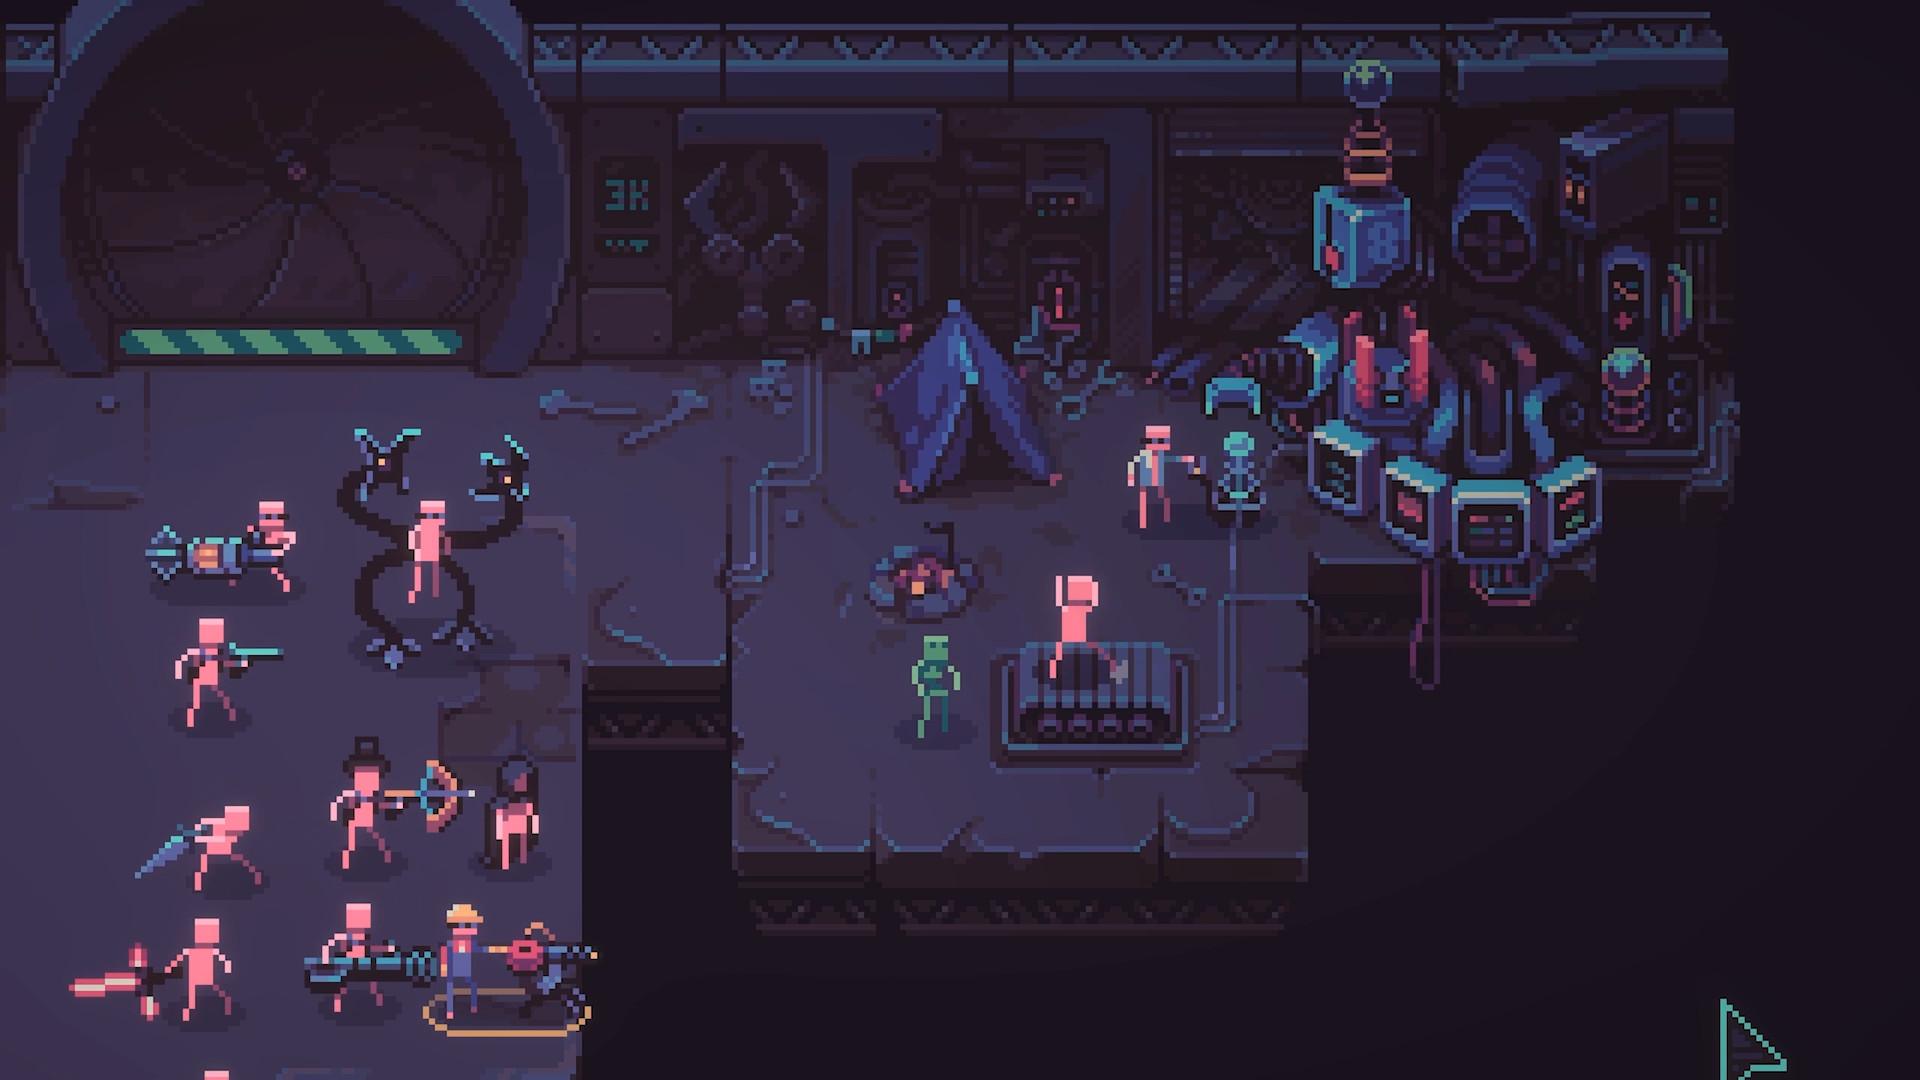 Despot's Game is a roguelike autobattler about refrigerators, pretzels, and dark gods